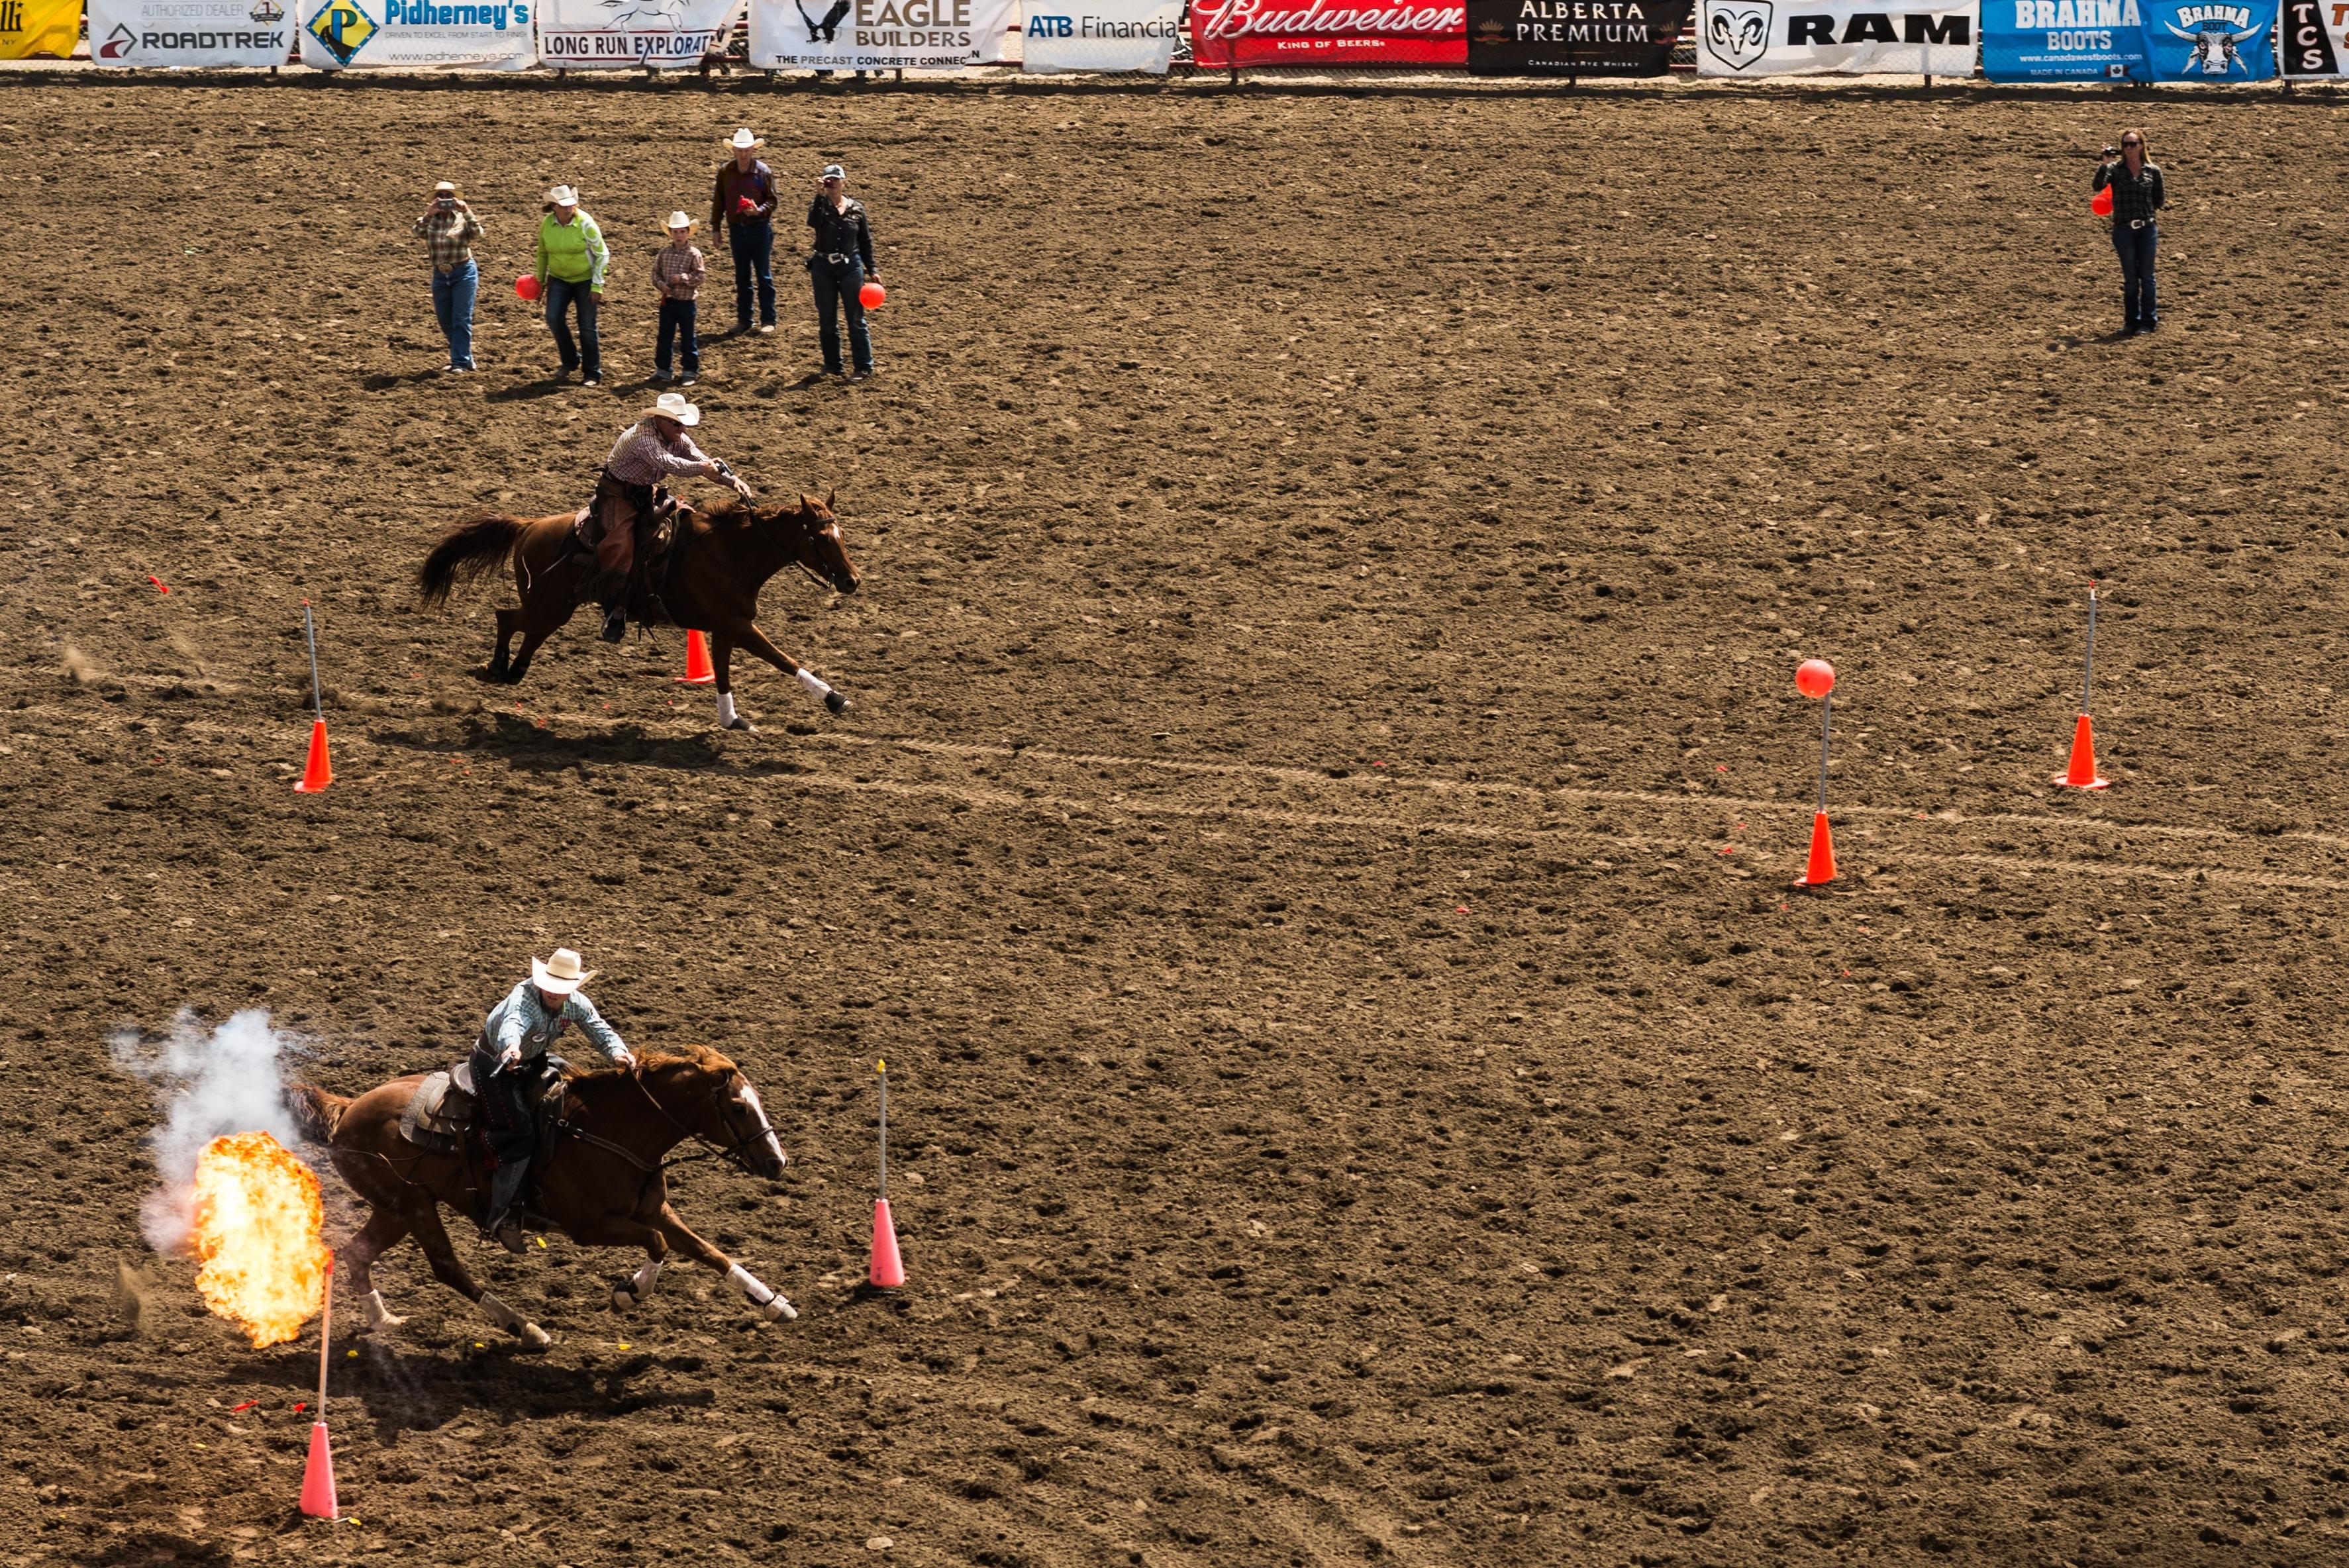 two men racing horseback riding